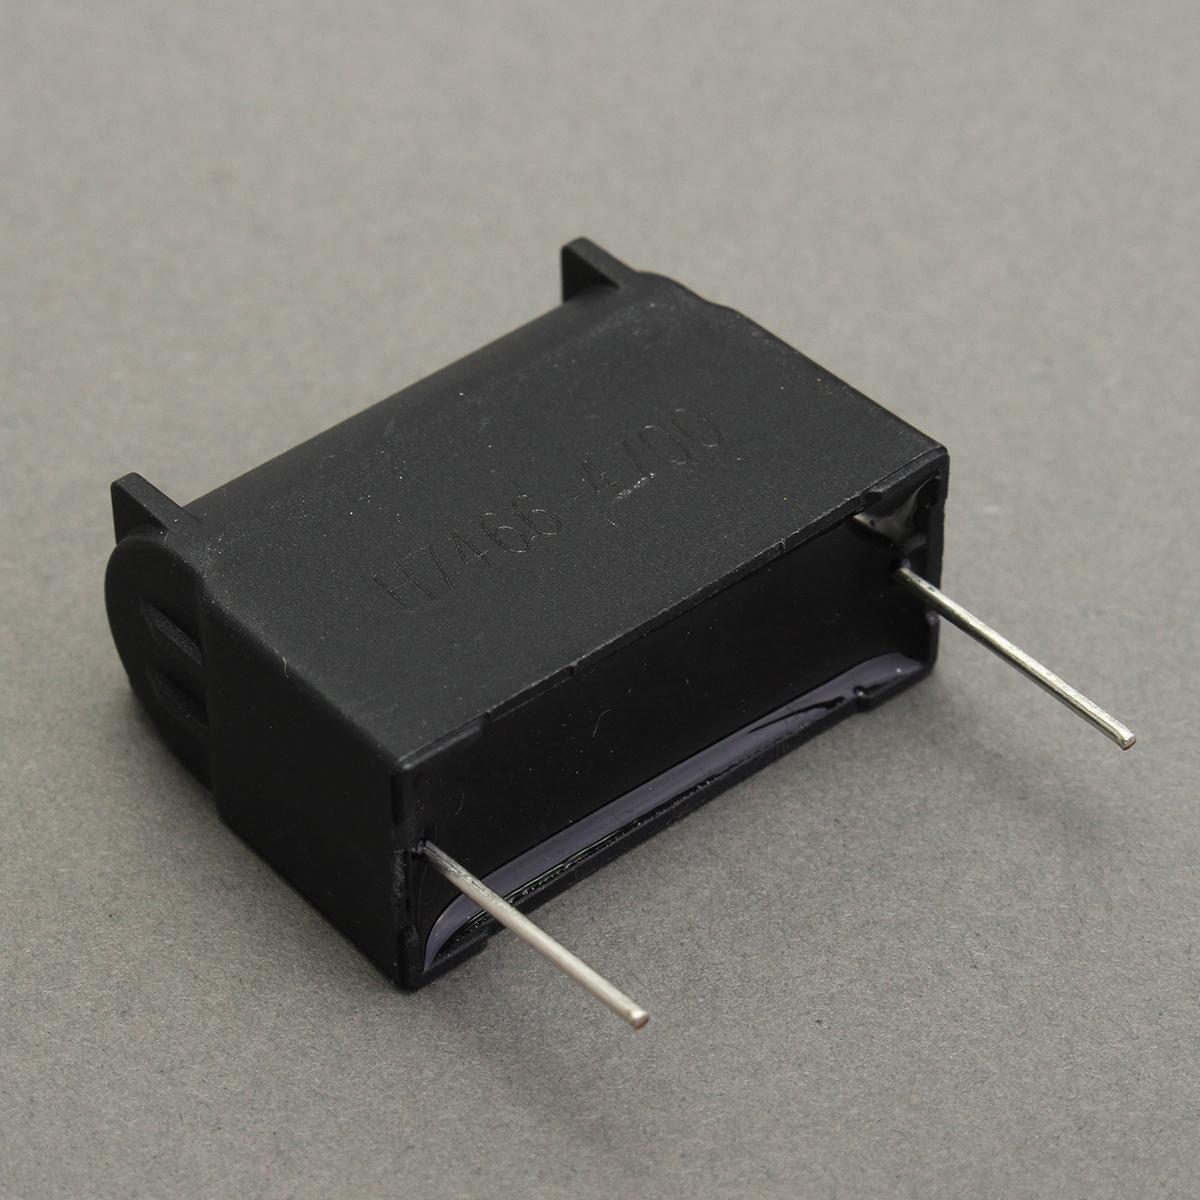 DIY Booster High Voltage Generator Plasma Music Arc Speaker ZVS Tesla Coil Kit